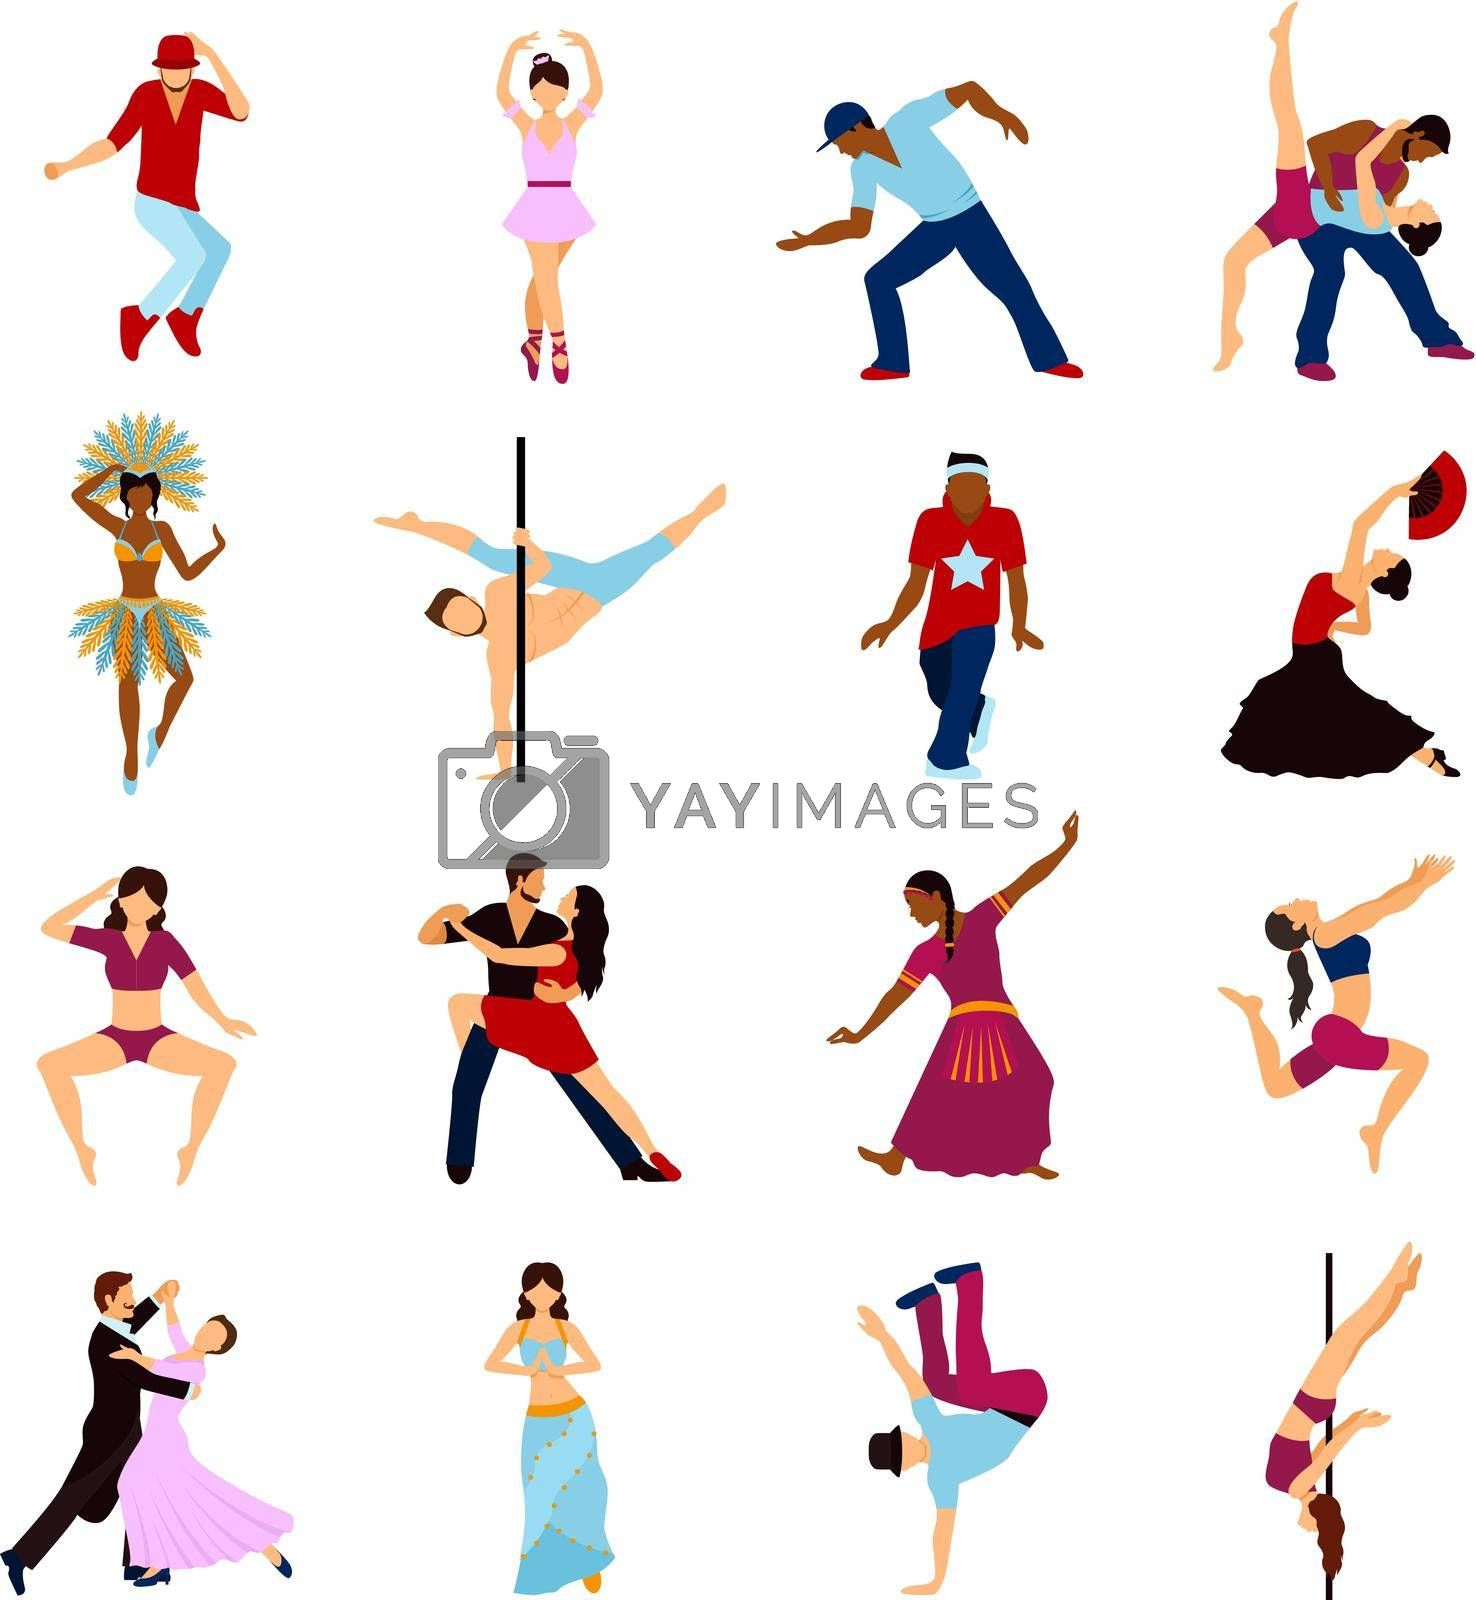 Royalty free image of People Dancing Set by mstjahanara